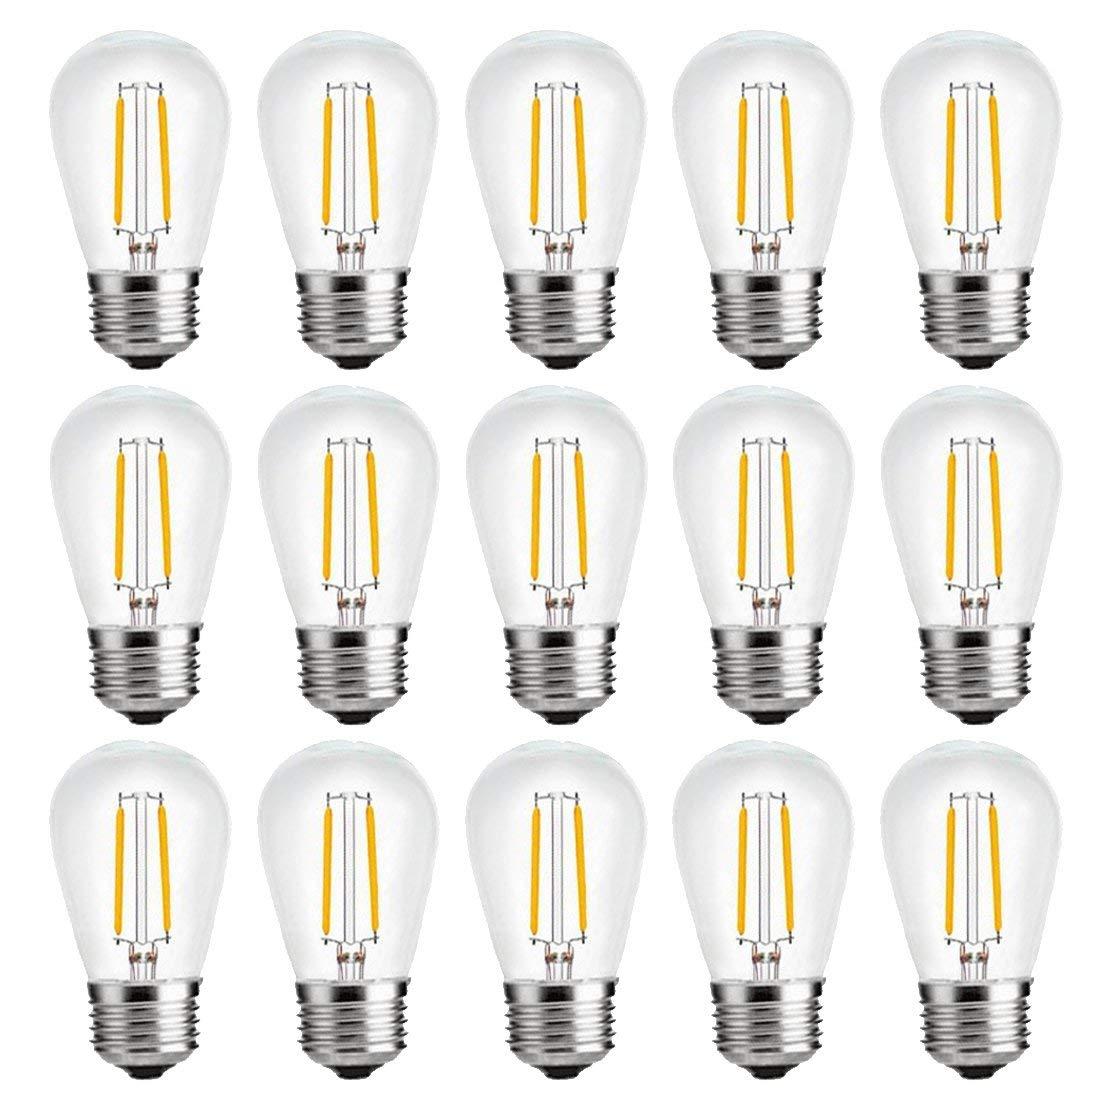 S14 Bulbs,2W LED Bulbs, Vintage Edison Led Light Bulbs,2700K (Warm White), 200 lumens, E26 Medium Base Lamp, Great for String Lights, Commercial Lighting, Patio, Wedding,Party, NOT-Dimmable,15 Pack